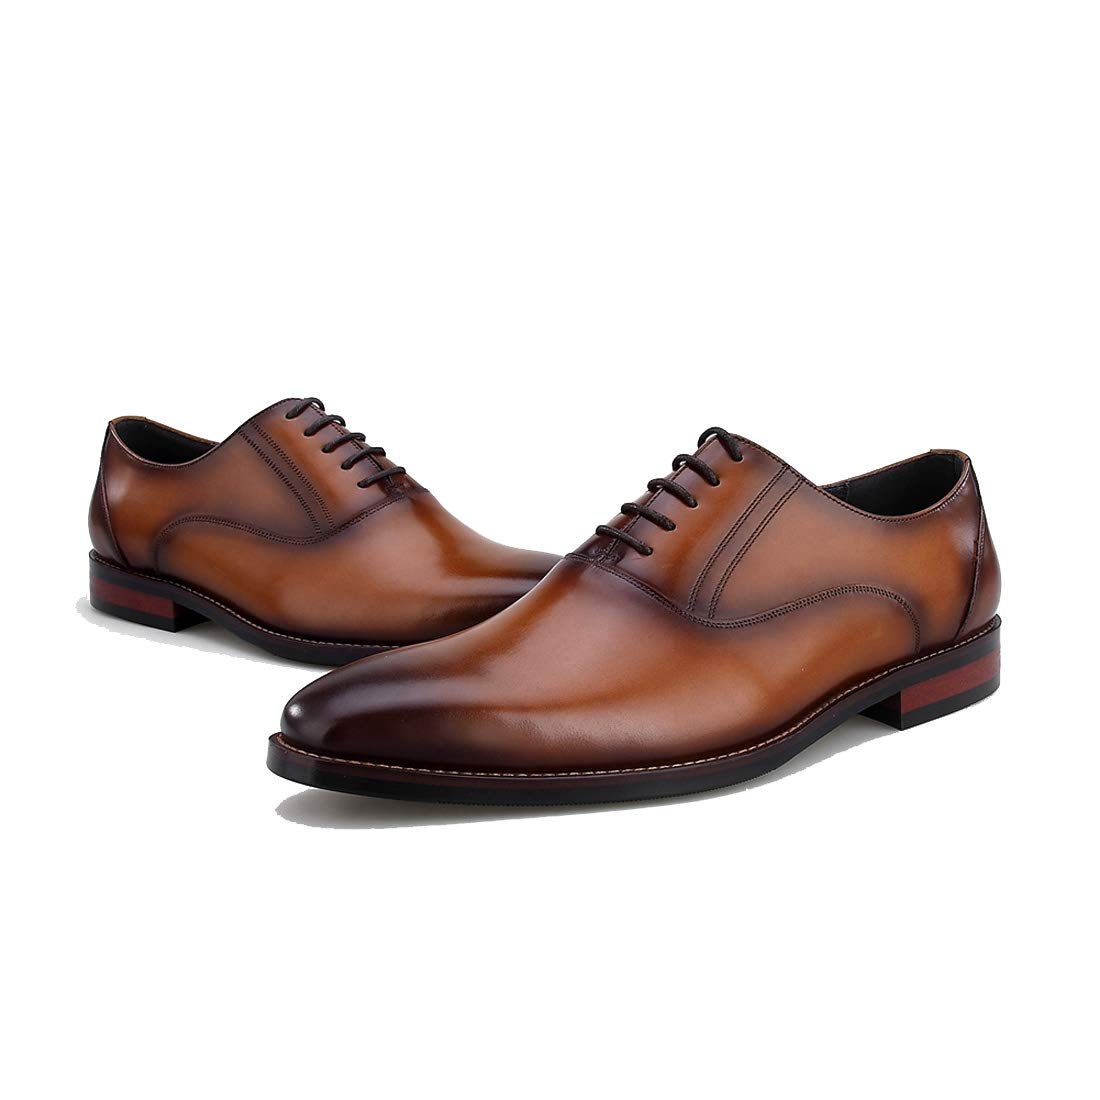 Mens Formal Shoes Business Oxfords Burgundy Dress Business Shoes High-End Business Dress Shoes,Brown,41EU 41EU brown B07HKH2P8N 086bab